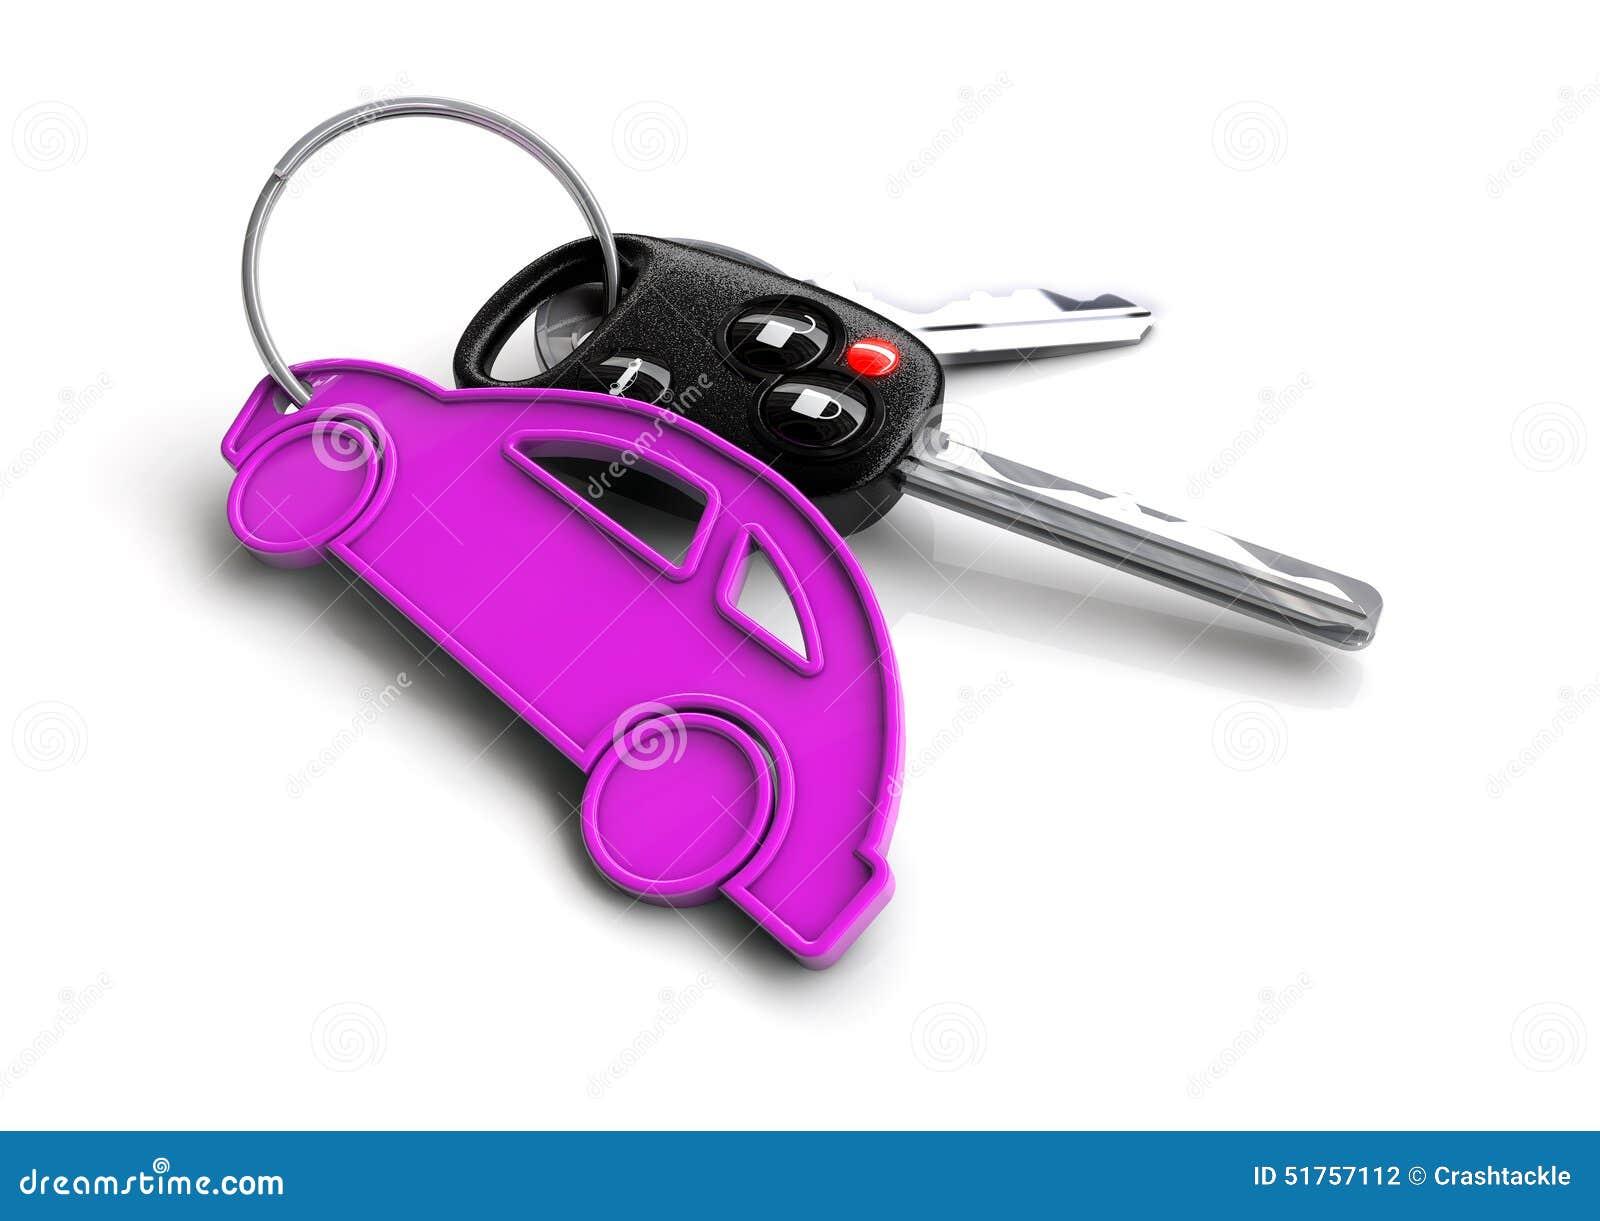 car keys with car icon keyring concept for car ownership stock illustration image 51757112. Black Bedroom Furniture Sets. Home Design Ideas